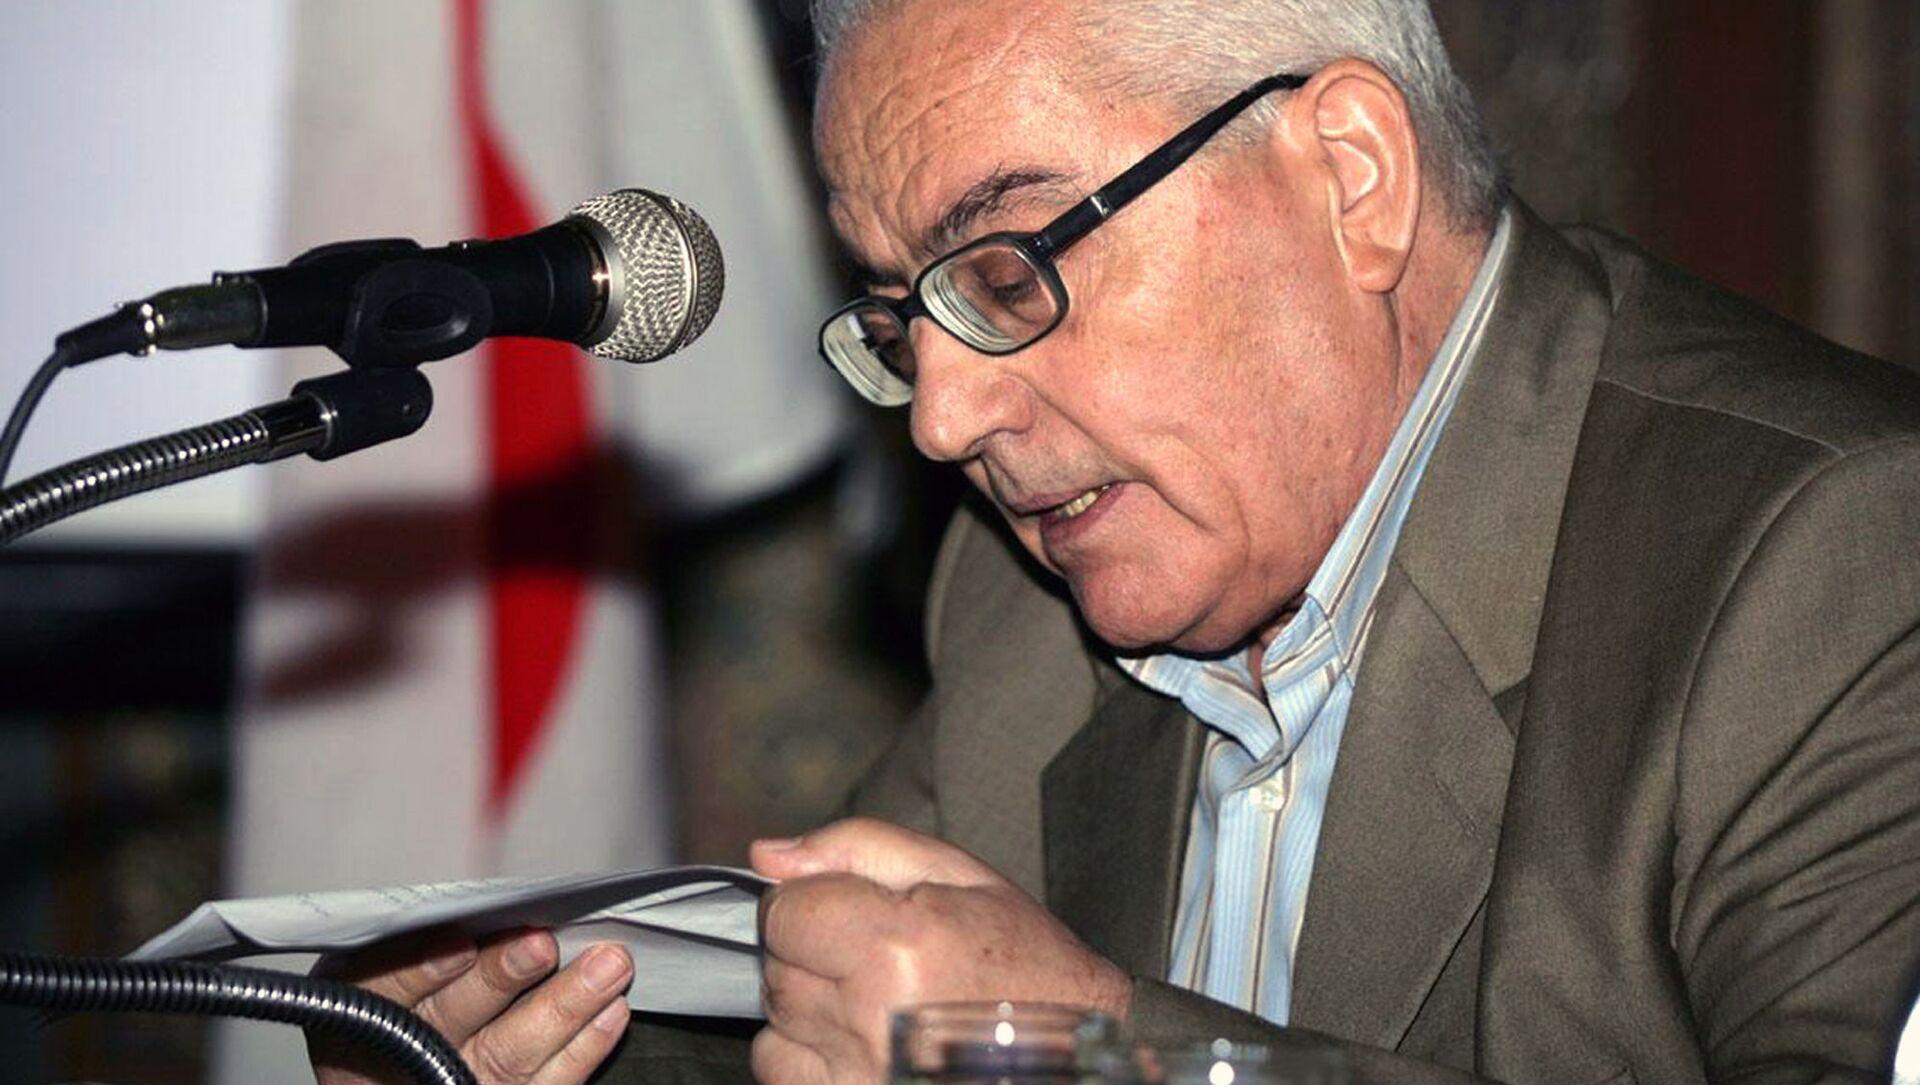 Archeologo Siriano Khalid Asaad - Sputnik Italia, 1920, 08.02.2021